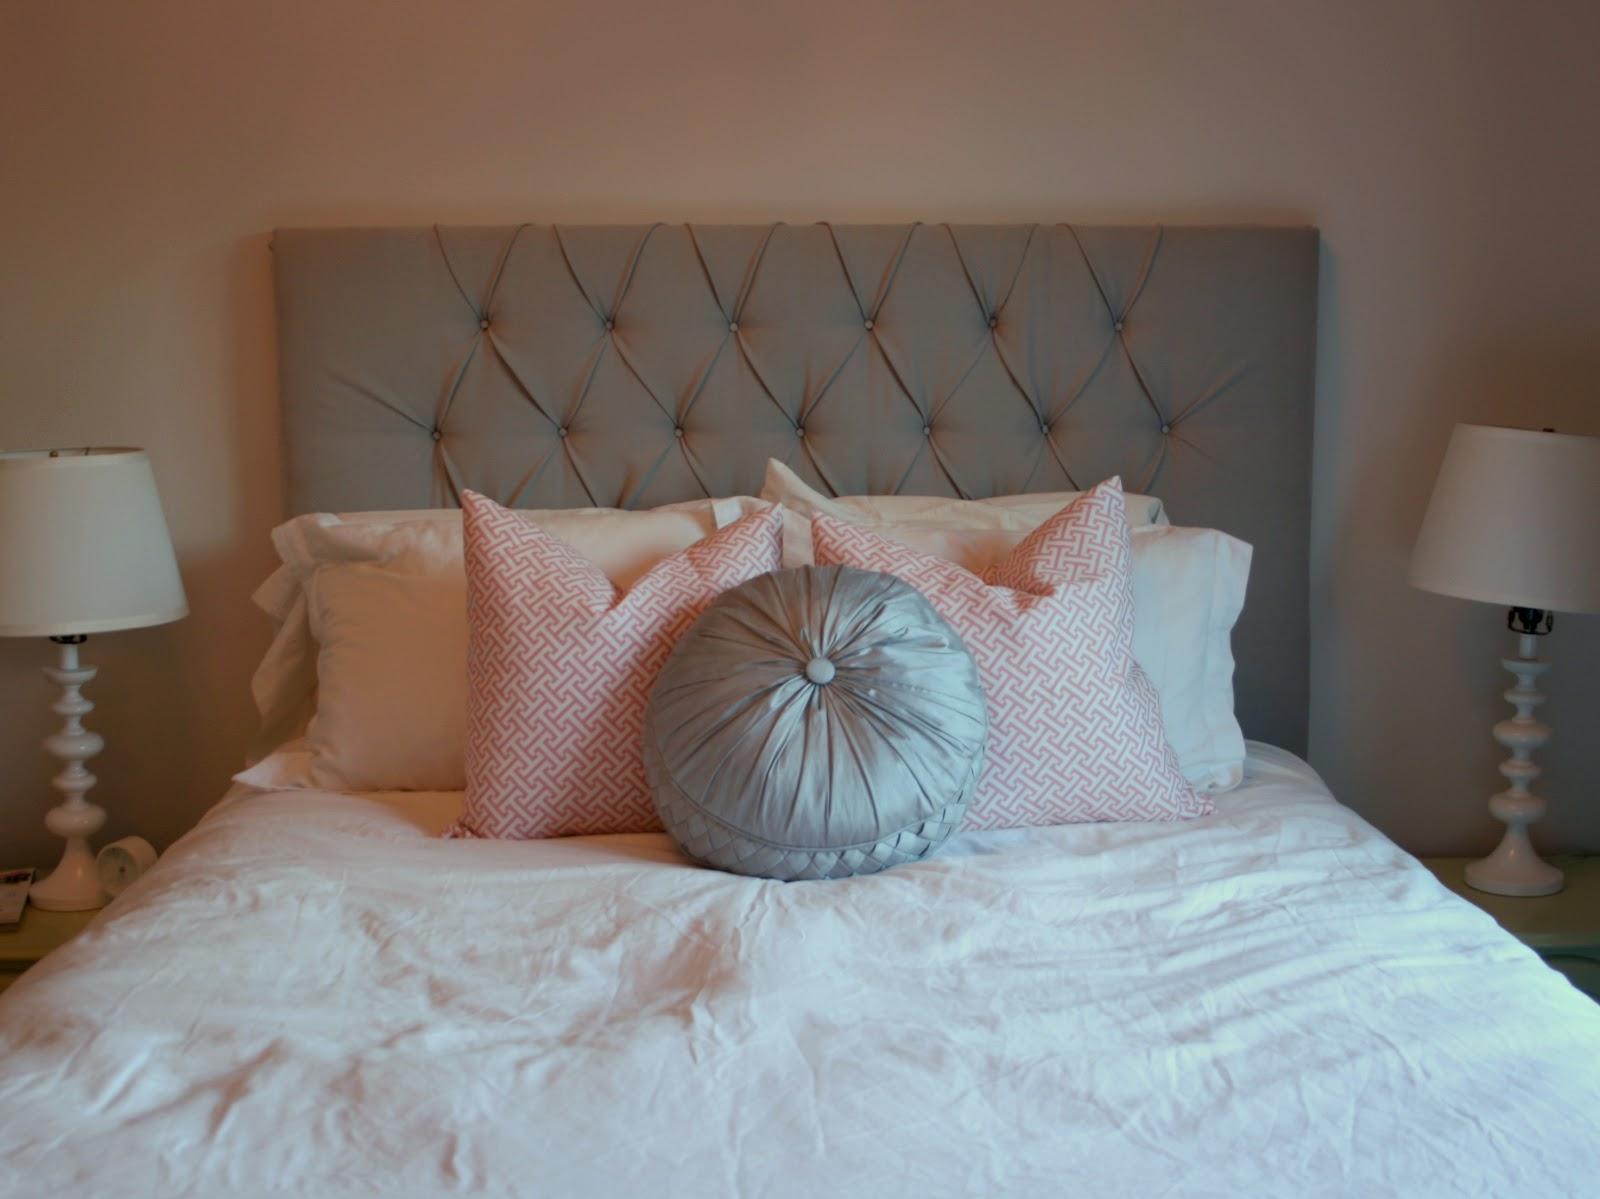 Мягкие кровати своими руками